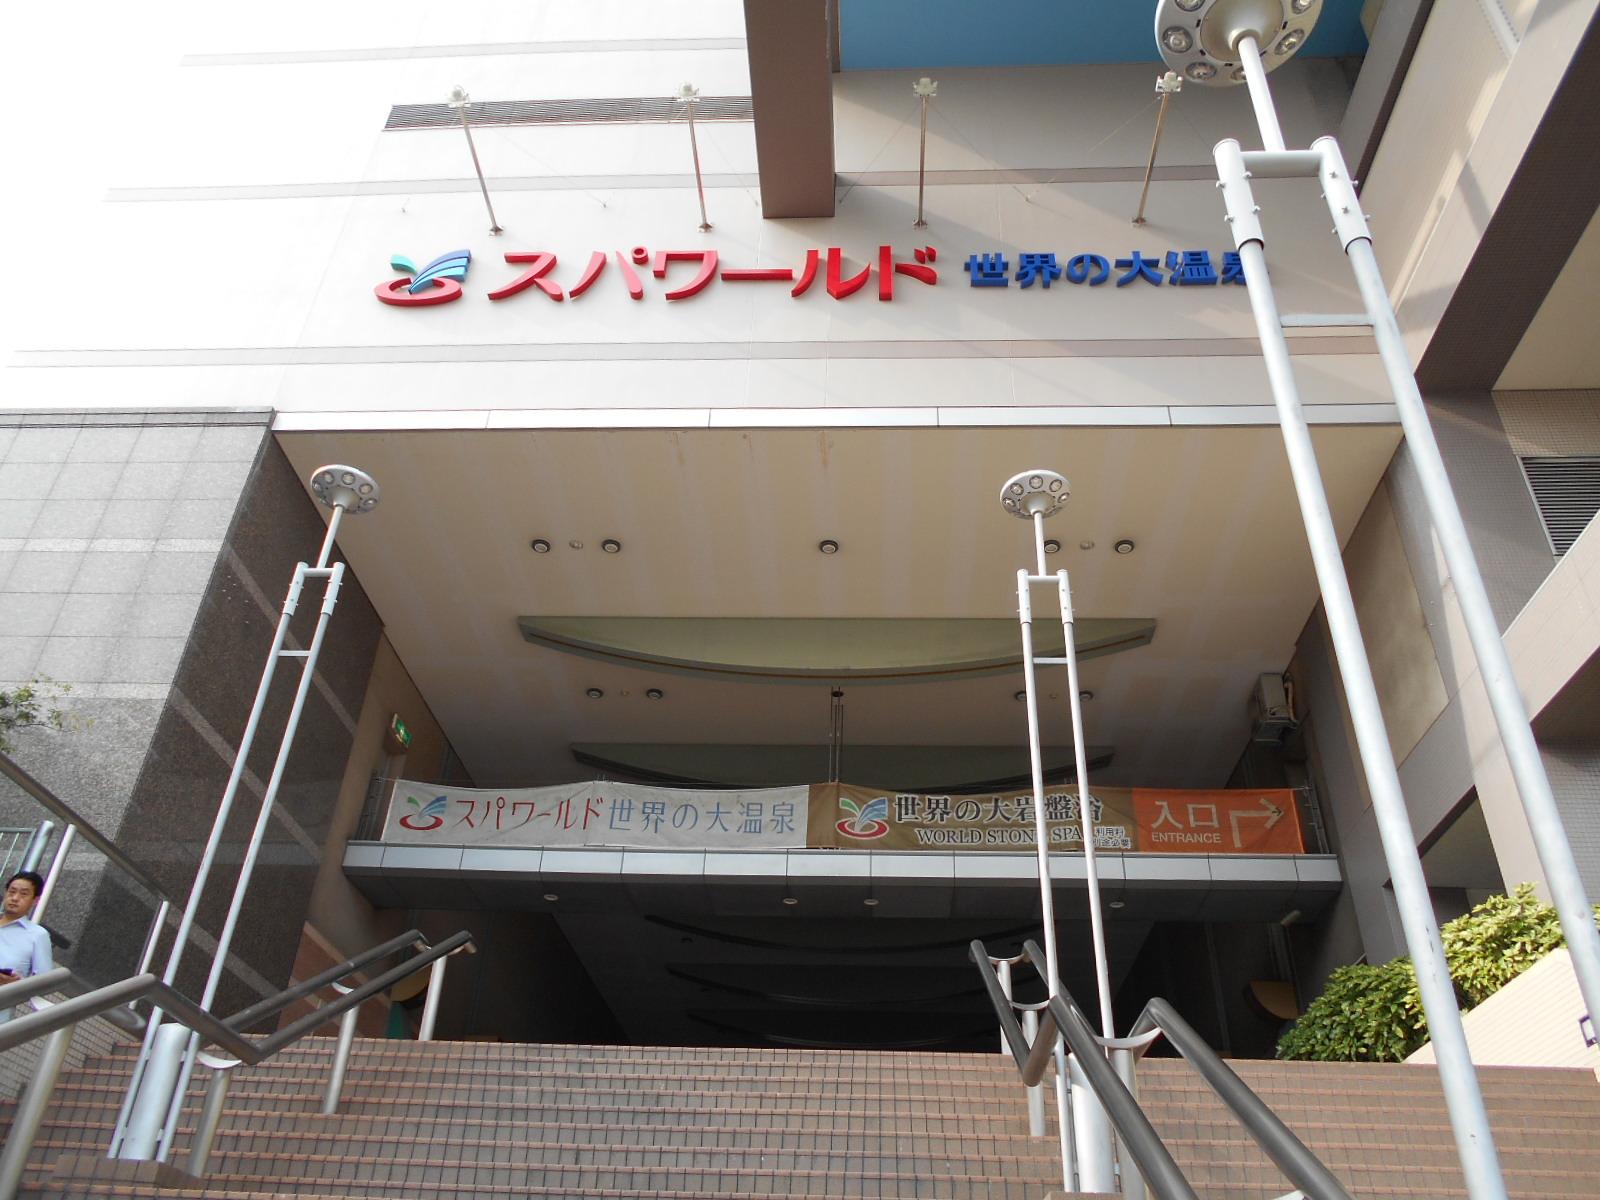 RPJ展示会に行ってきました_b0189682_20484961.jpg